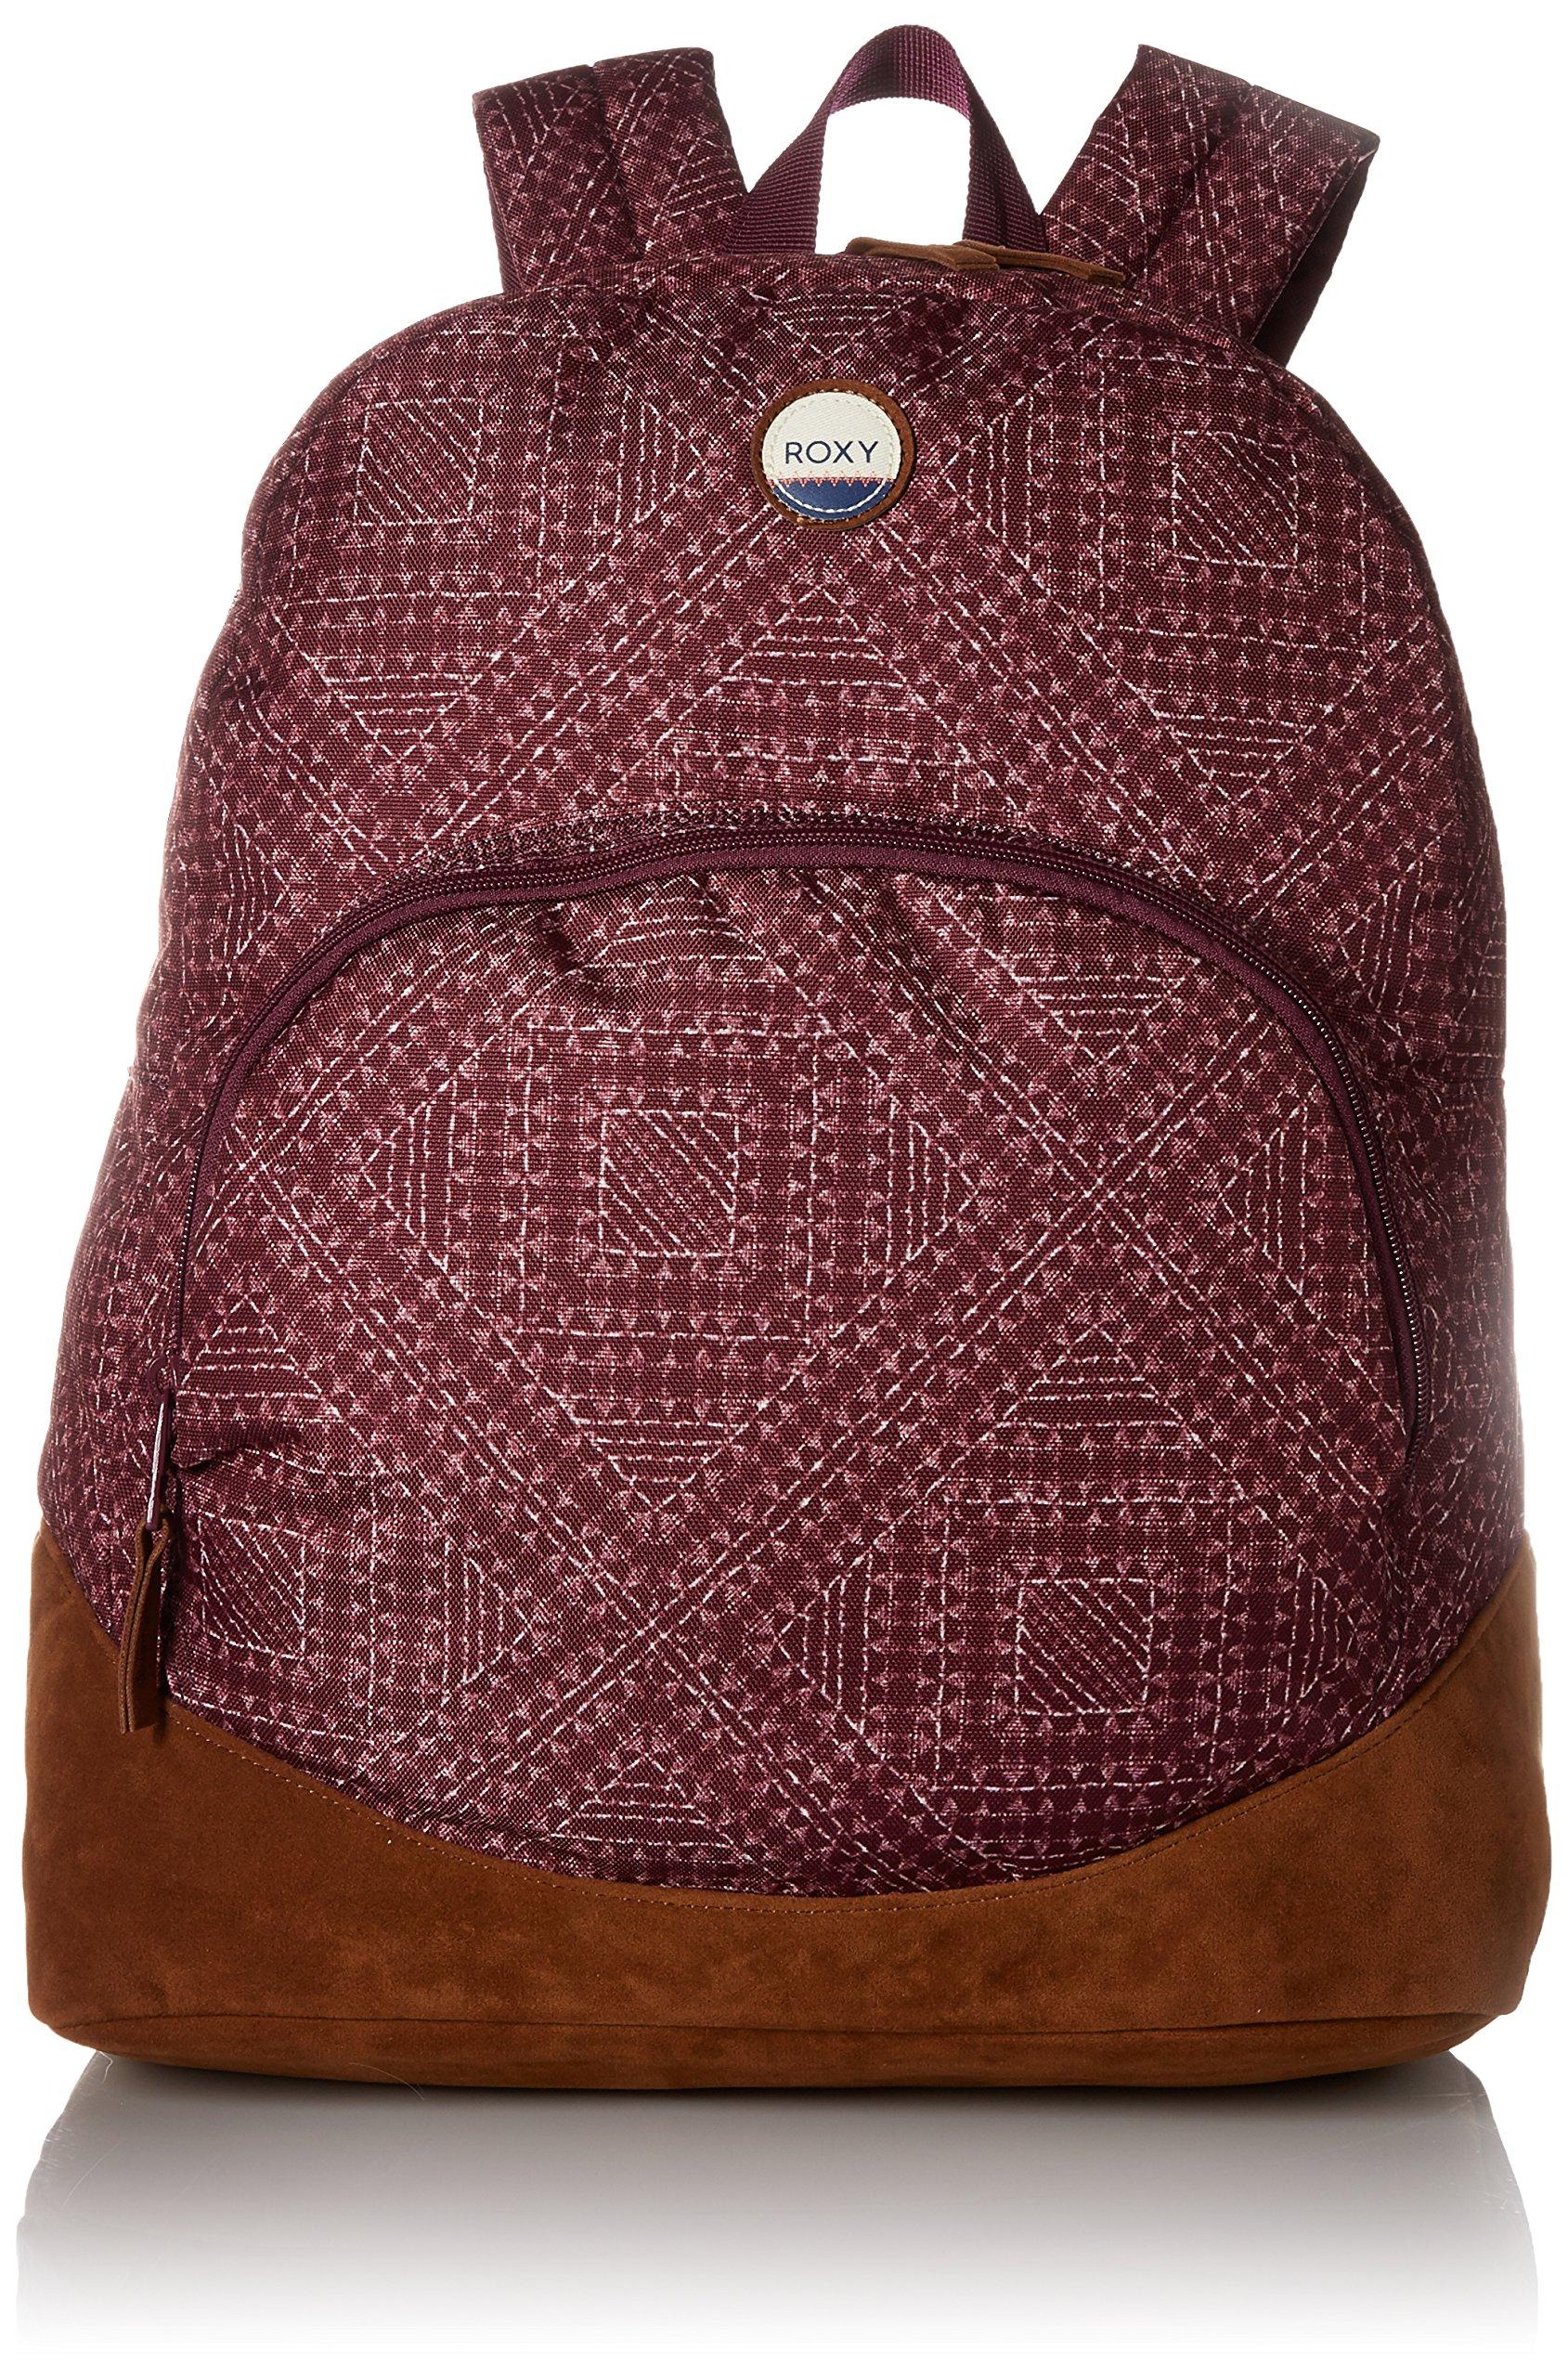 Roxy Women's Fairness Printed Backpack, Grapewine Cayo Coco